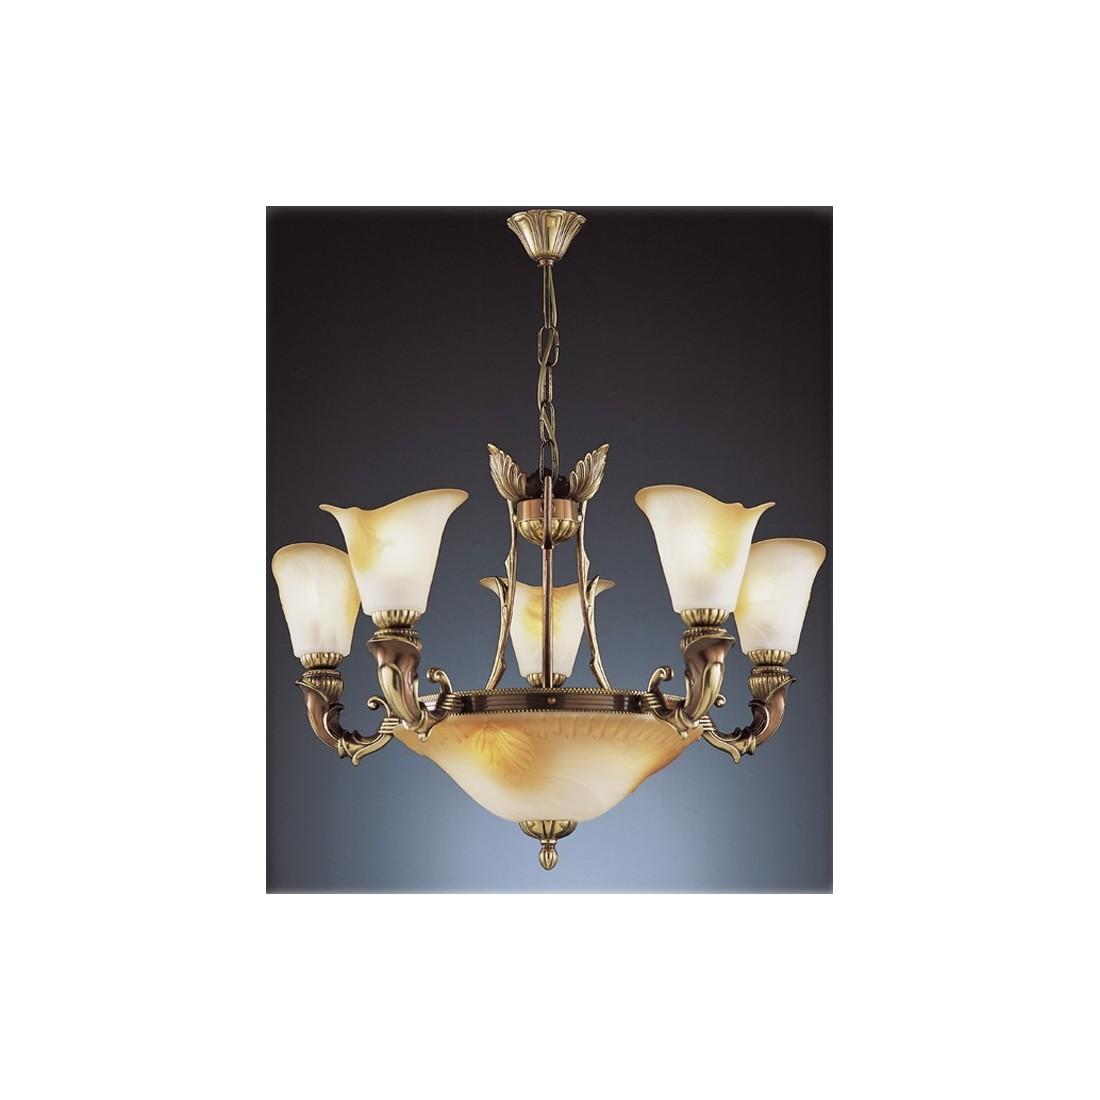 Semiplaf n de bronce con tulipas de cristal de murano - Lamparas de cristal de murano ...